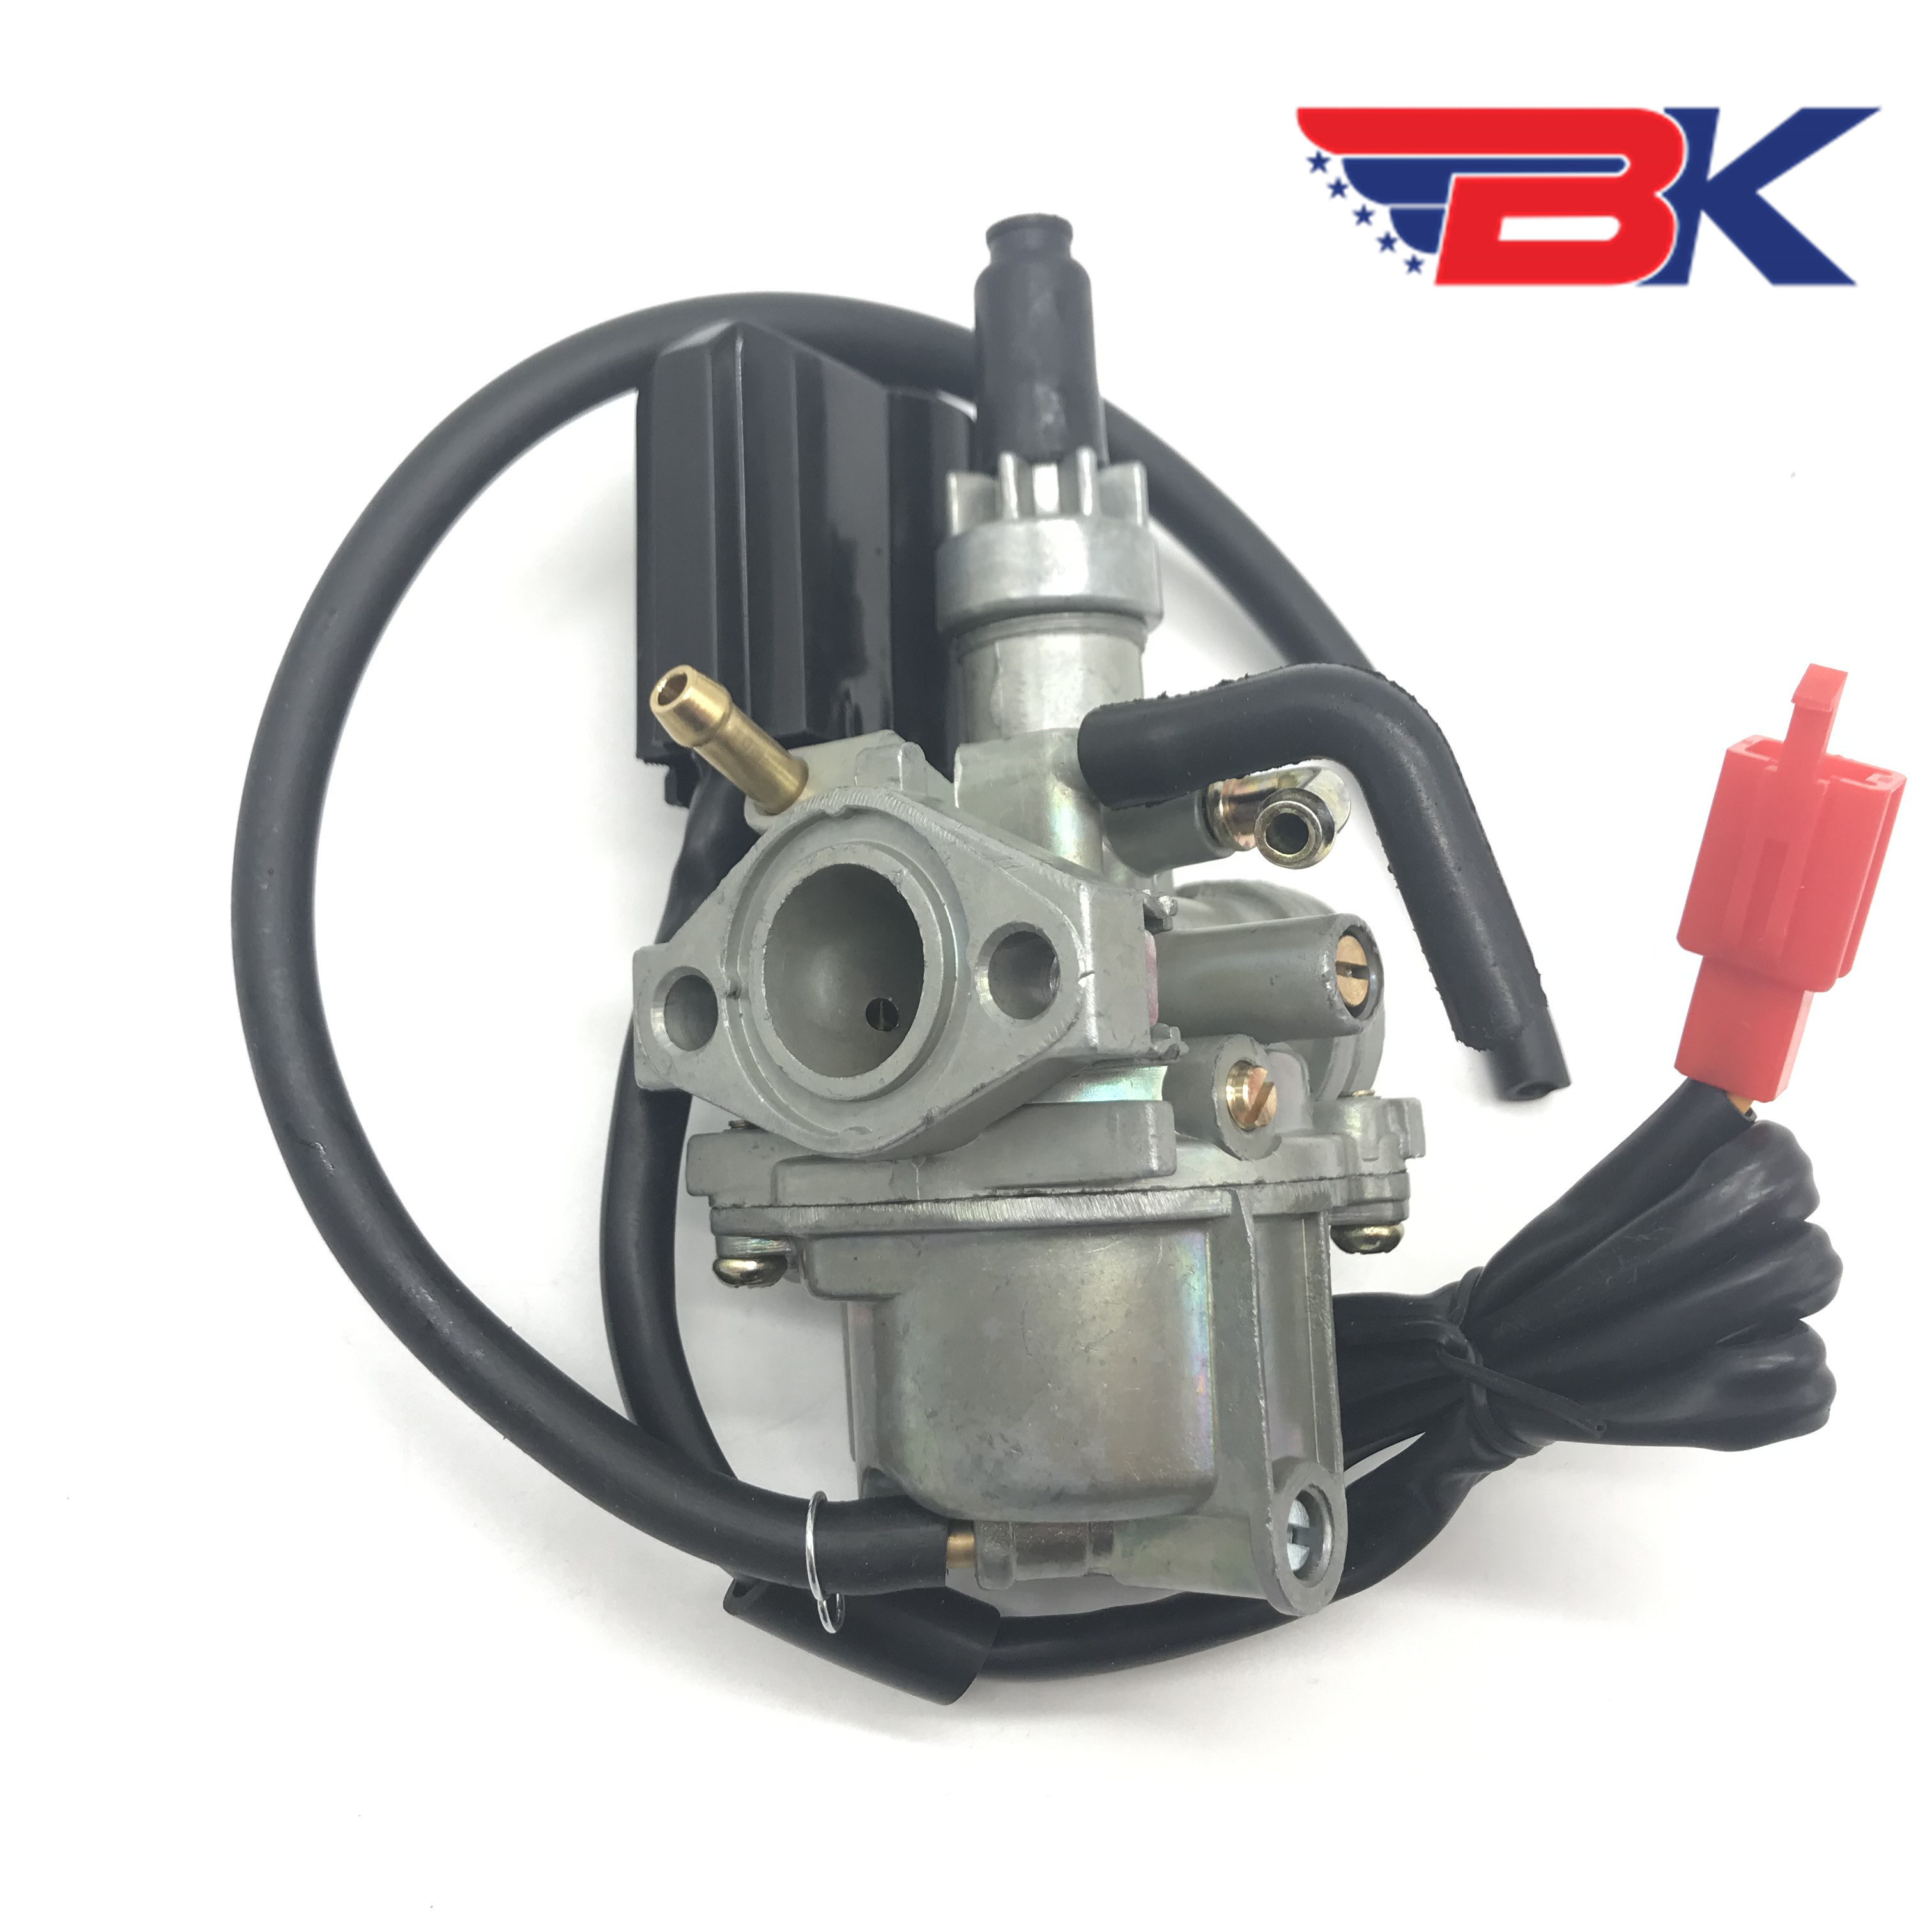 17mm Carburetor Fits For Honda 2 Stroke 50cc Dio 50 SP ZX34 35 SYM Kymco Scooter